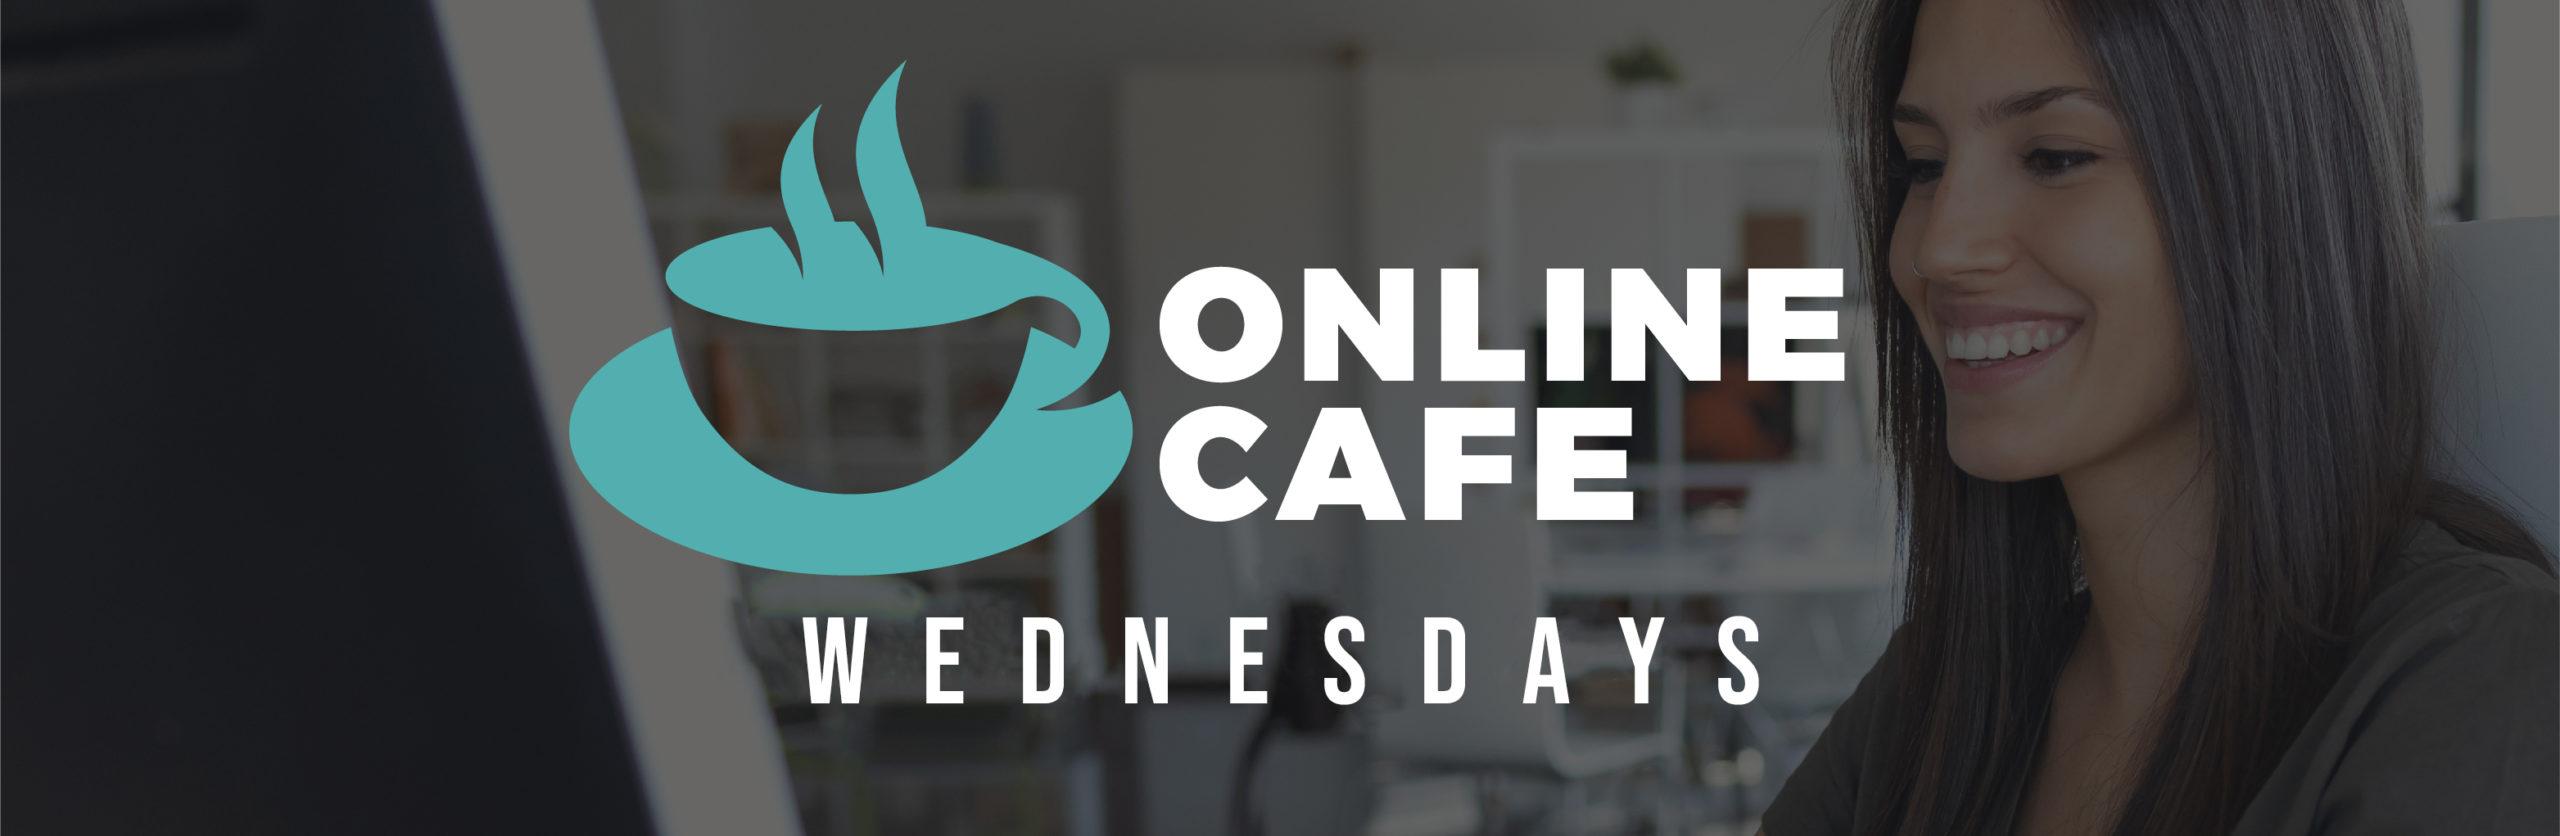 Online Cafe-Wednesdays